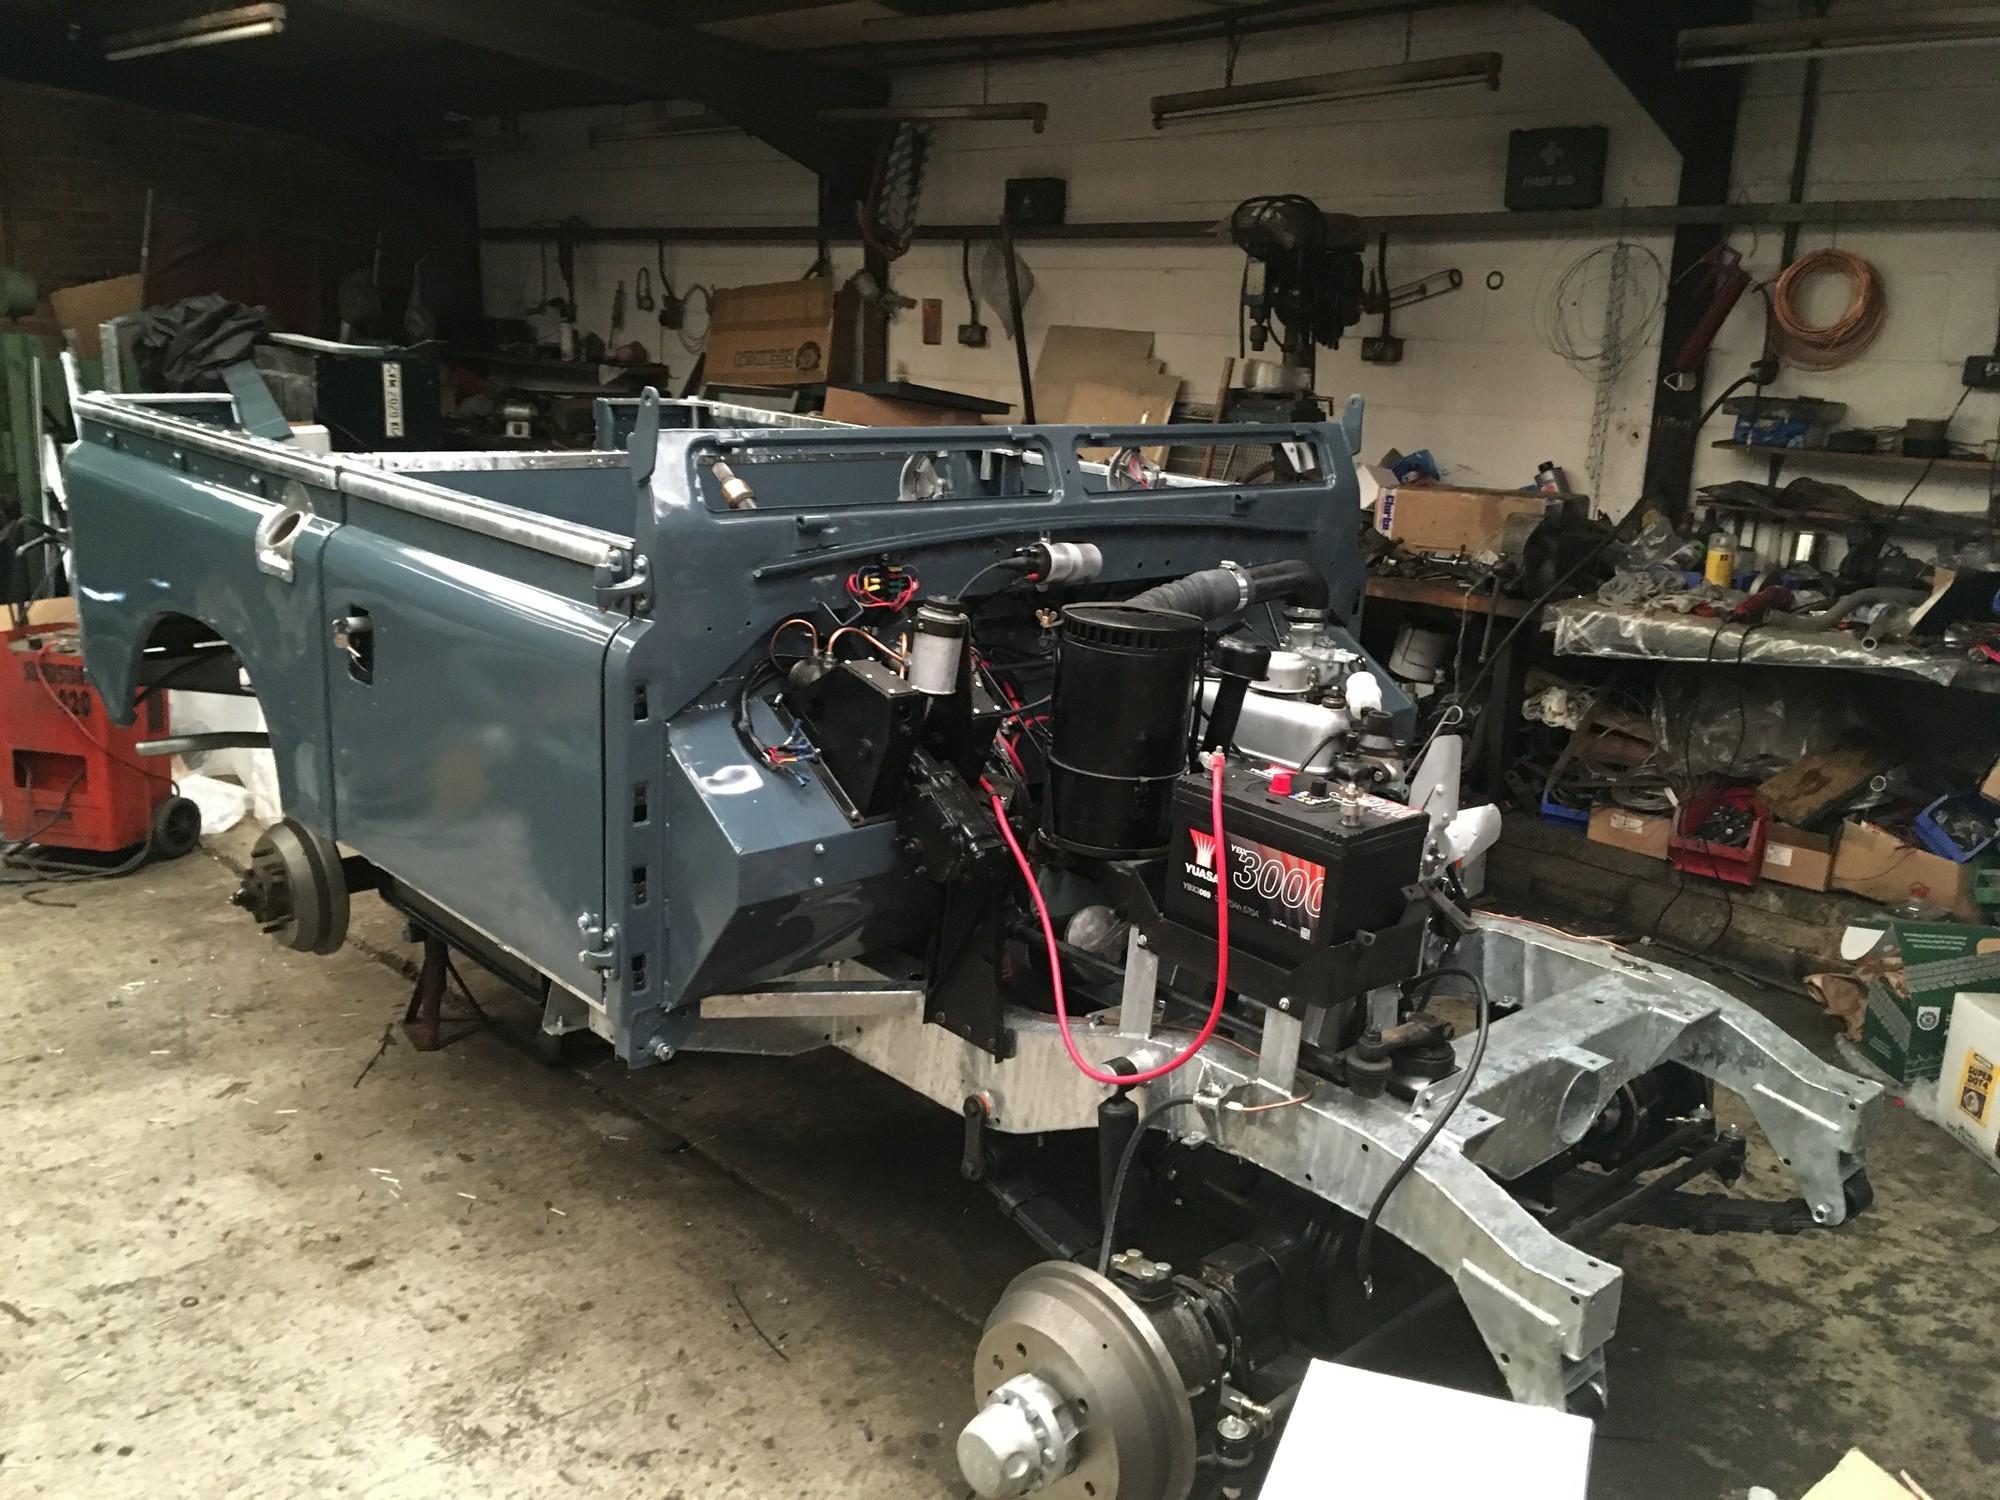 1962 Land Rover Series 2 restoration